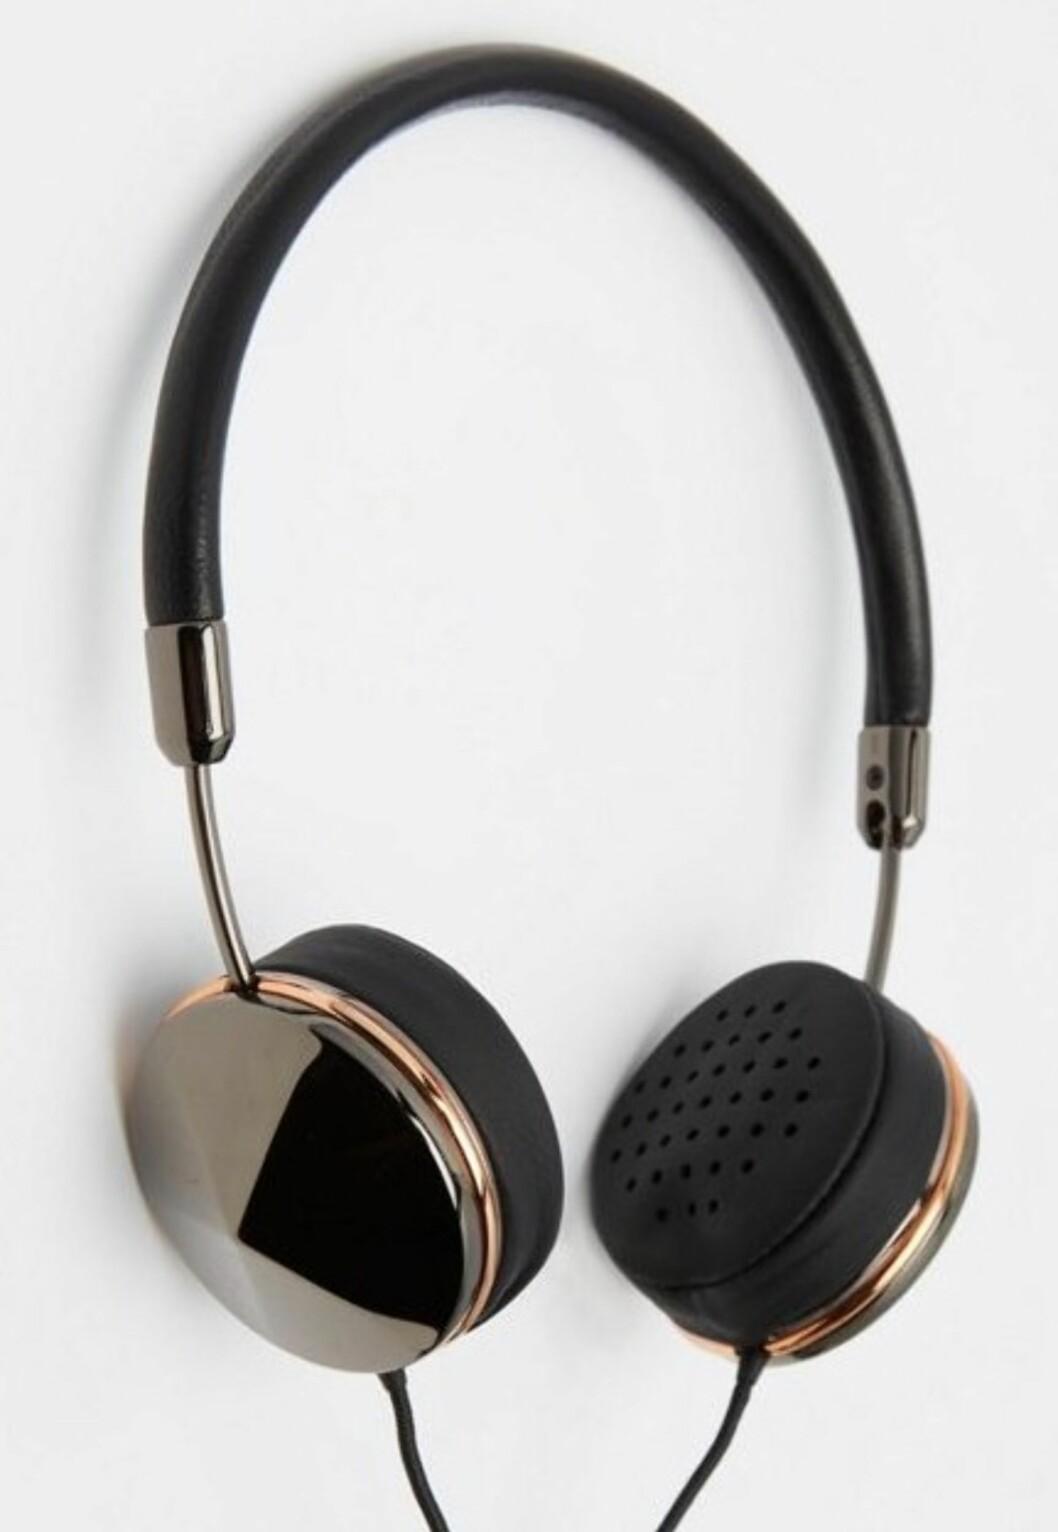 Headset fra FRENDS via Asos.com   kr 1590   http://ninjalink.com/s/ZXVrKMR43A